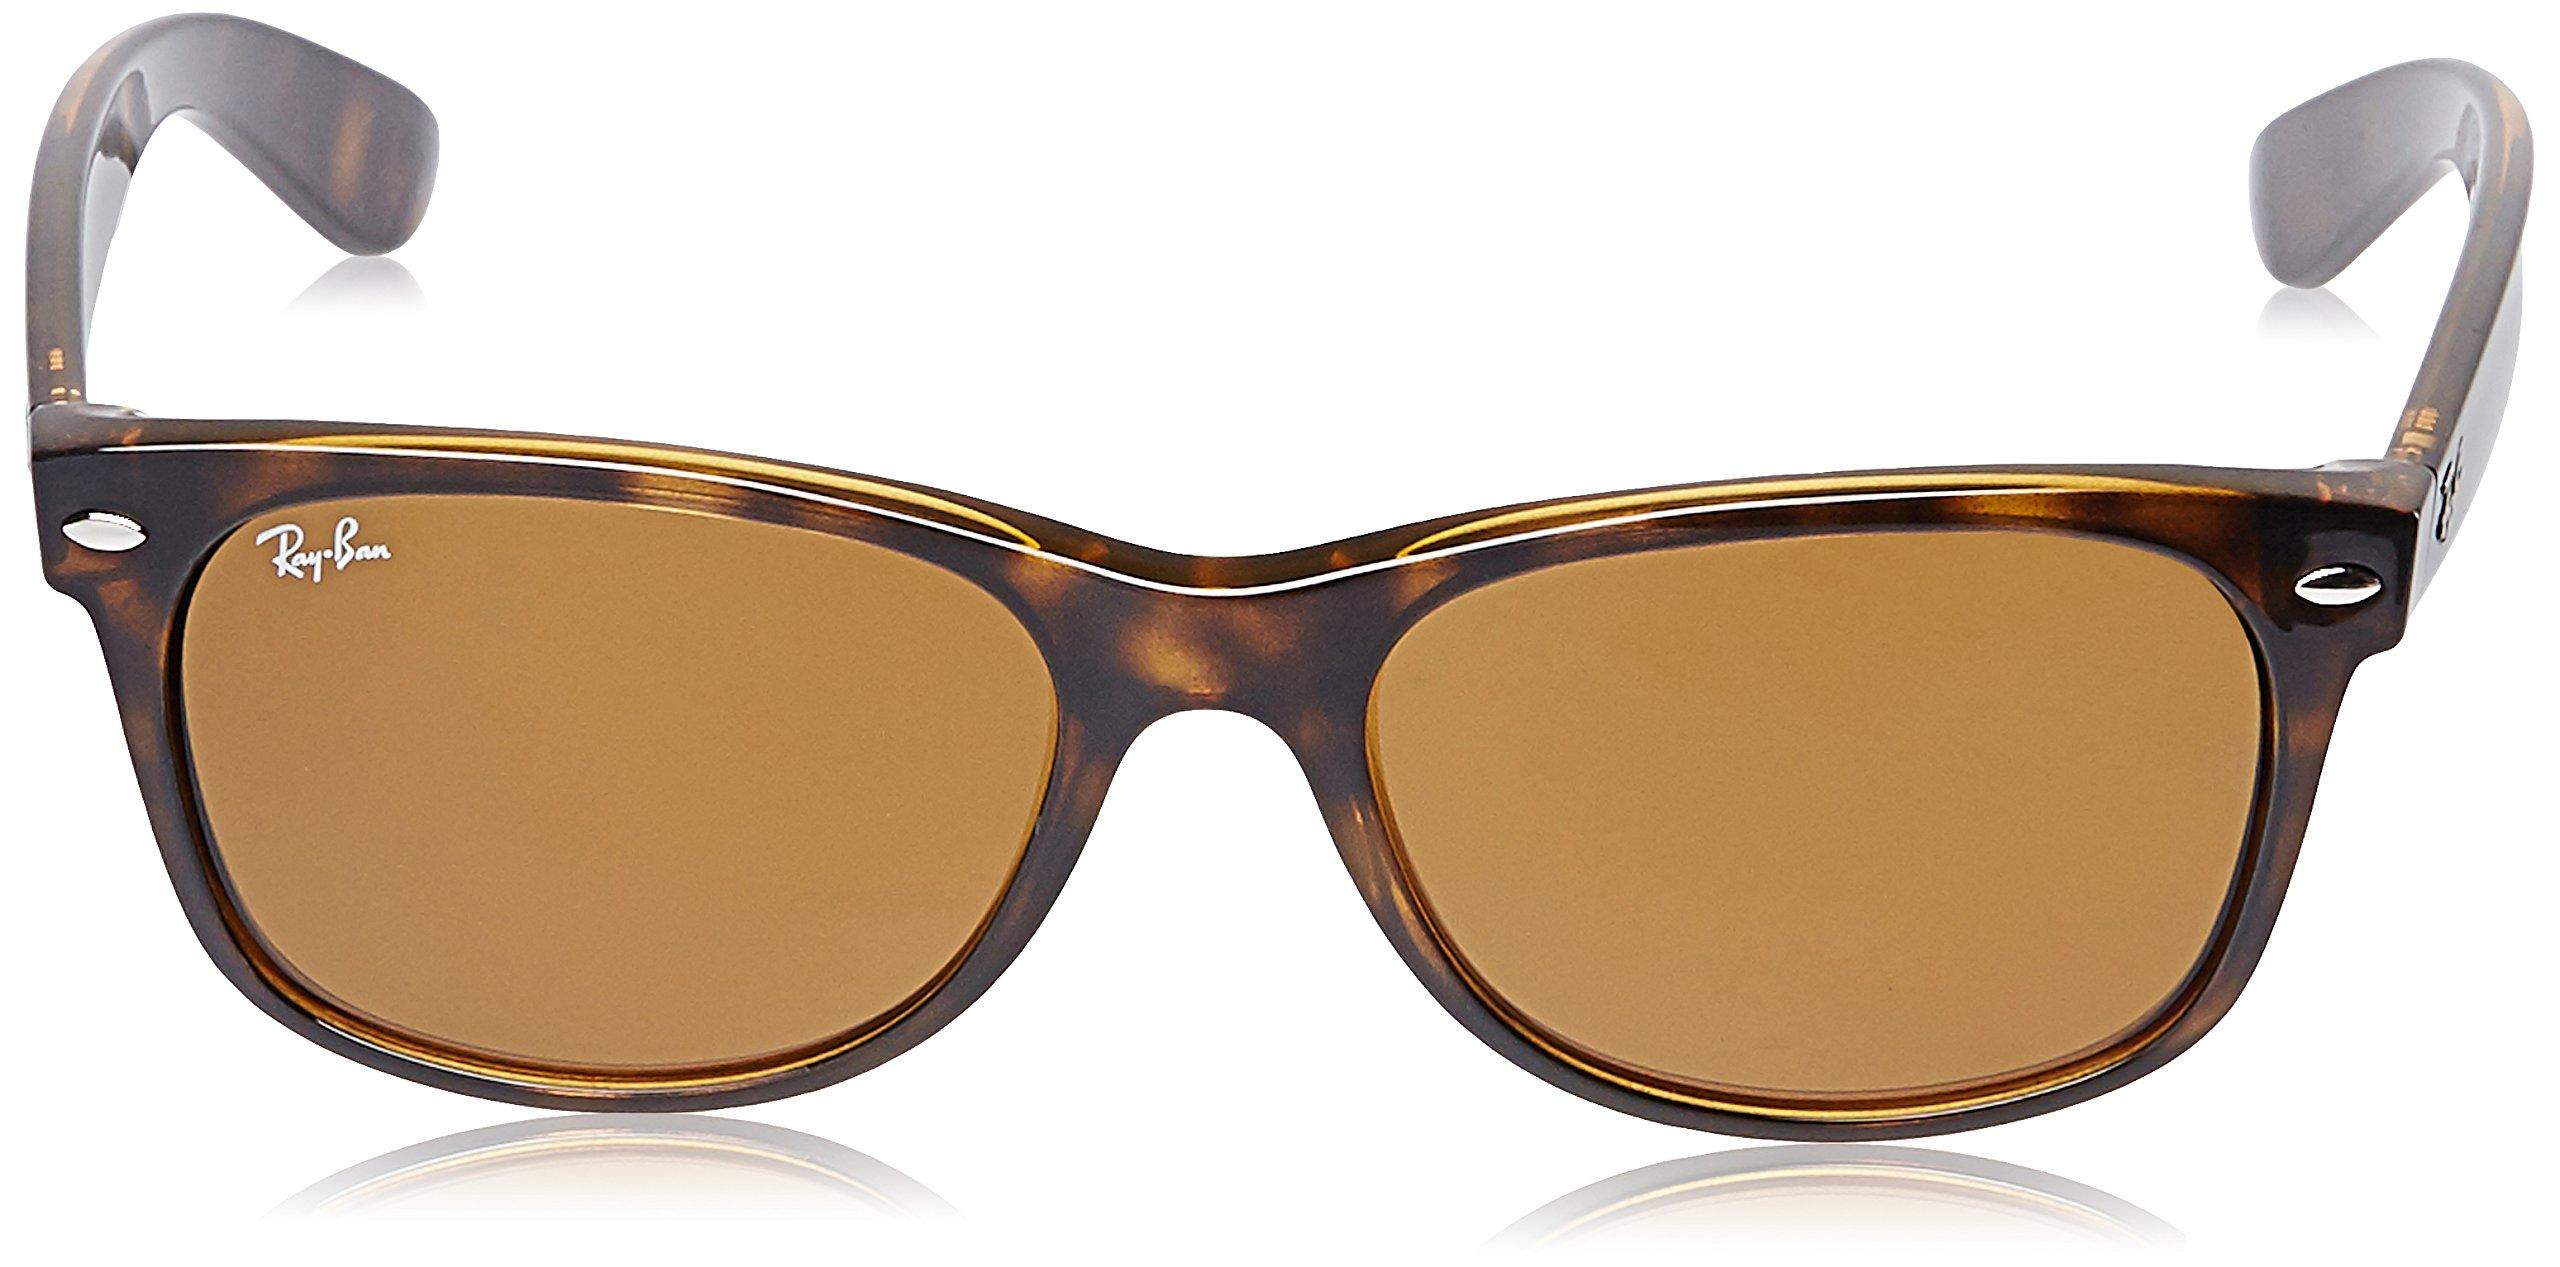 Ray-Ban, RB2132, New Wayfarer Sunglasses, Unisex Ray-Ban Sunglasses, 100% UV Protection, Polarized Wayfarer, Reduce Eye Strain, Lightweight Plastic Frame, Glass Lenses, 58 mm Frame by Ray-Ban (Image #2)